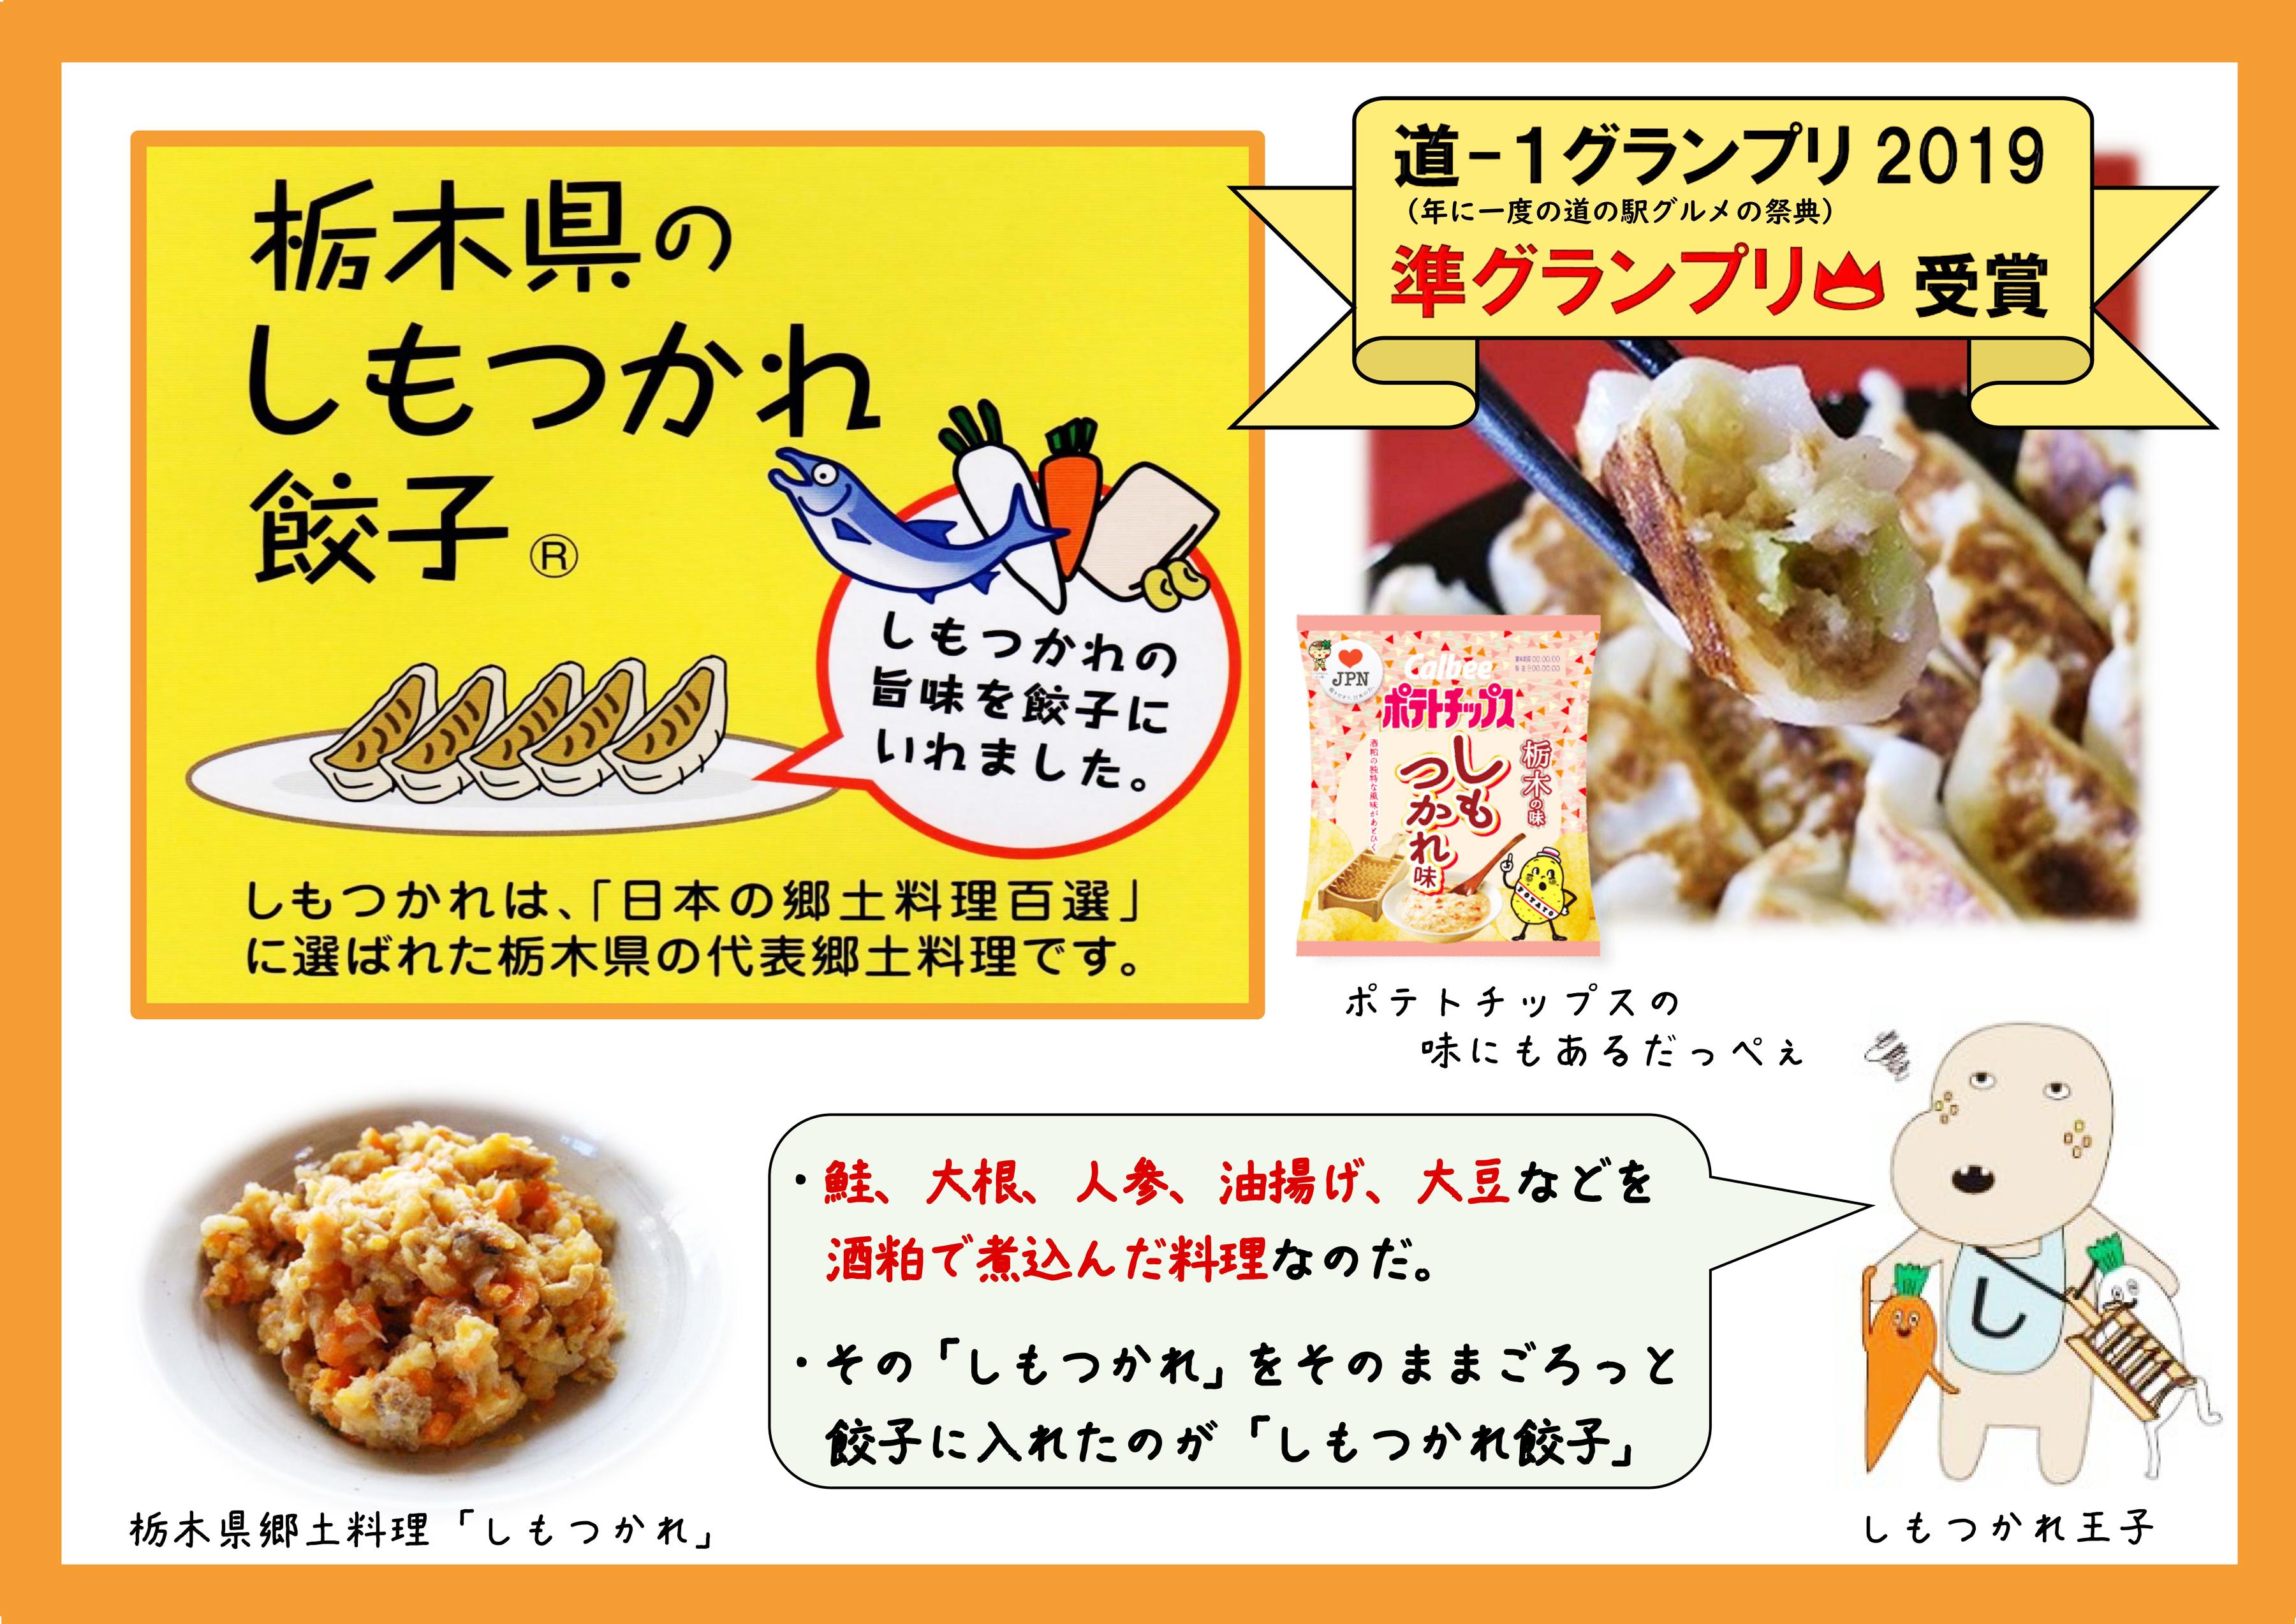 takumisfont_shimotsukare1.jpg